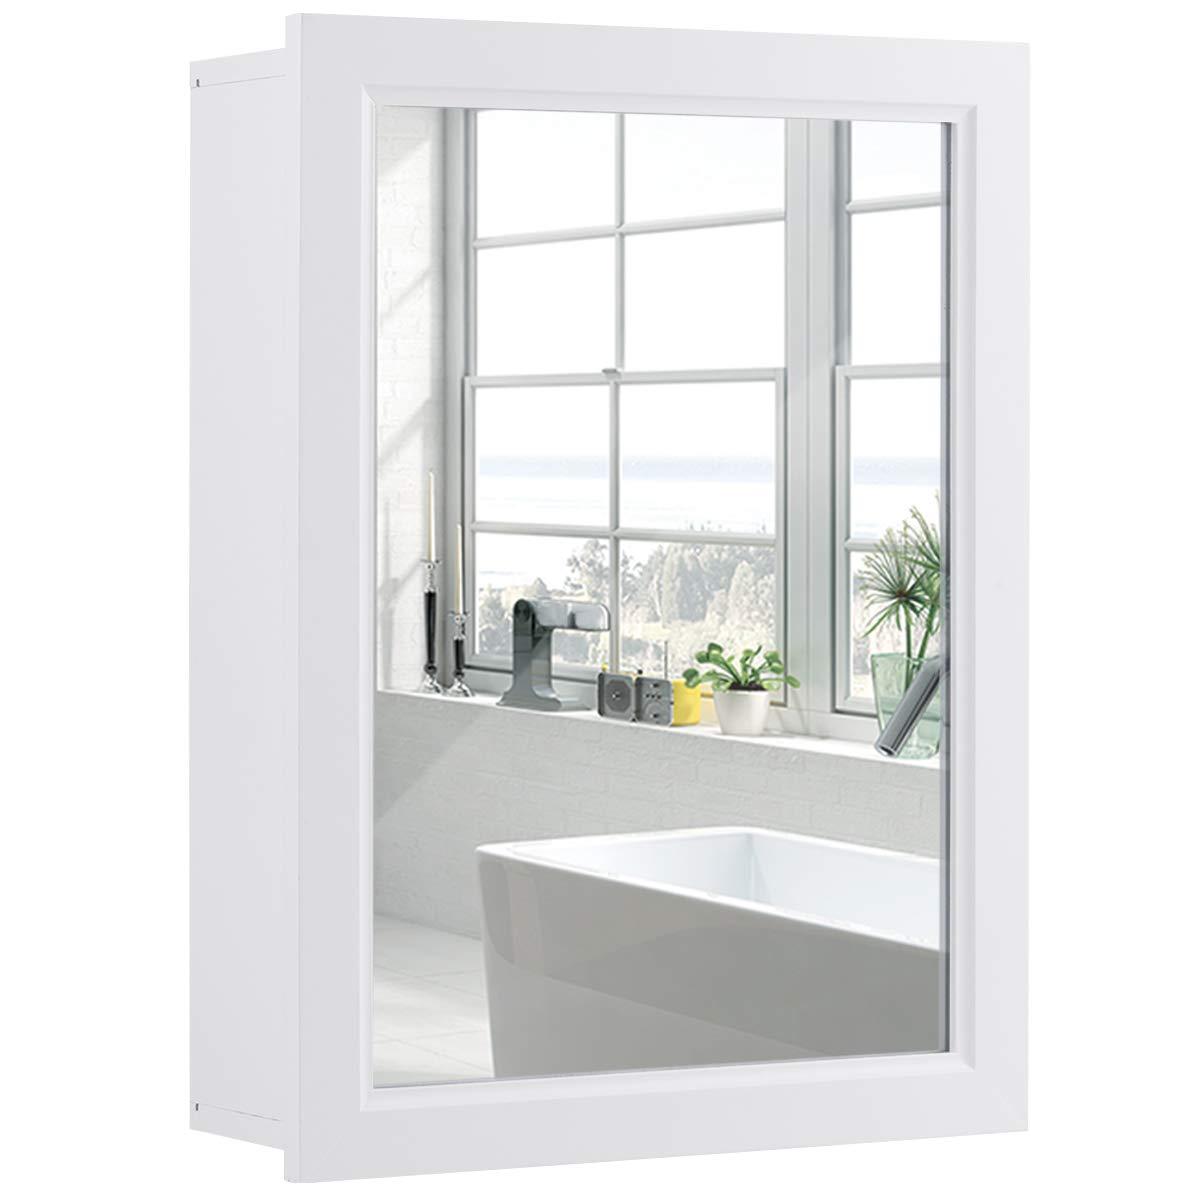 Tangkula Mirrored Bathroom Cabinet, Wall Mount Storage Organizer, Medicine Cabinet with Single Doors